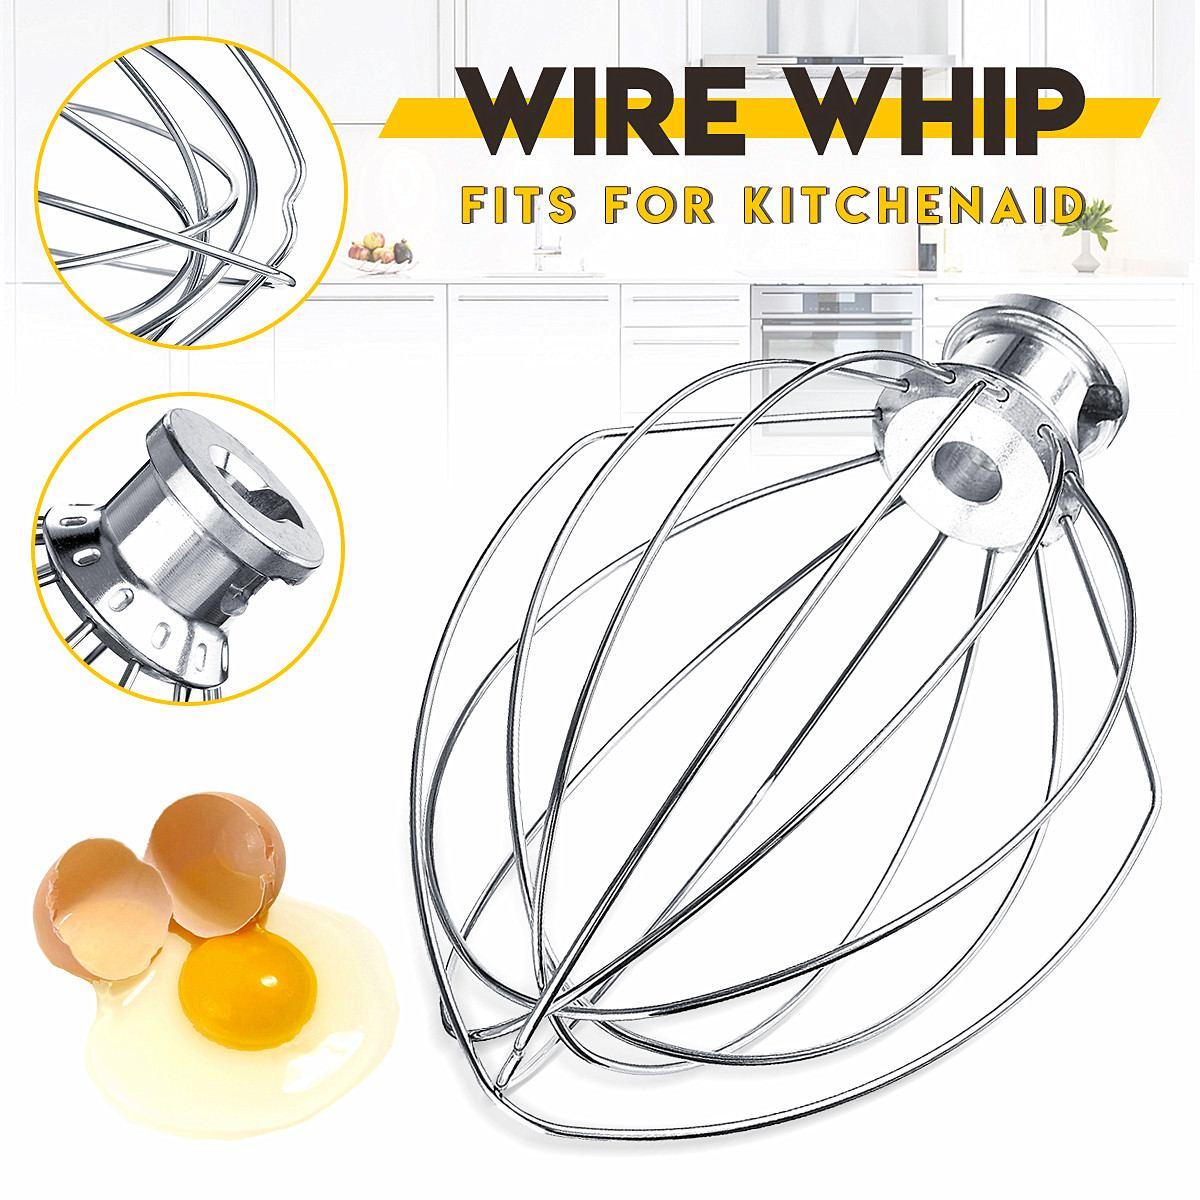 K-06 Wire Whip Whisk Egg Beater Cream Mixer Stainless Steel For  K5AWW Stand Mixers Milkshake Noodle Maker